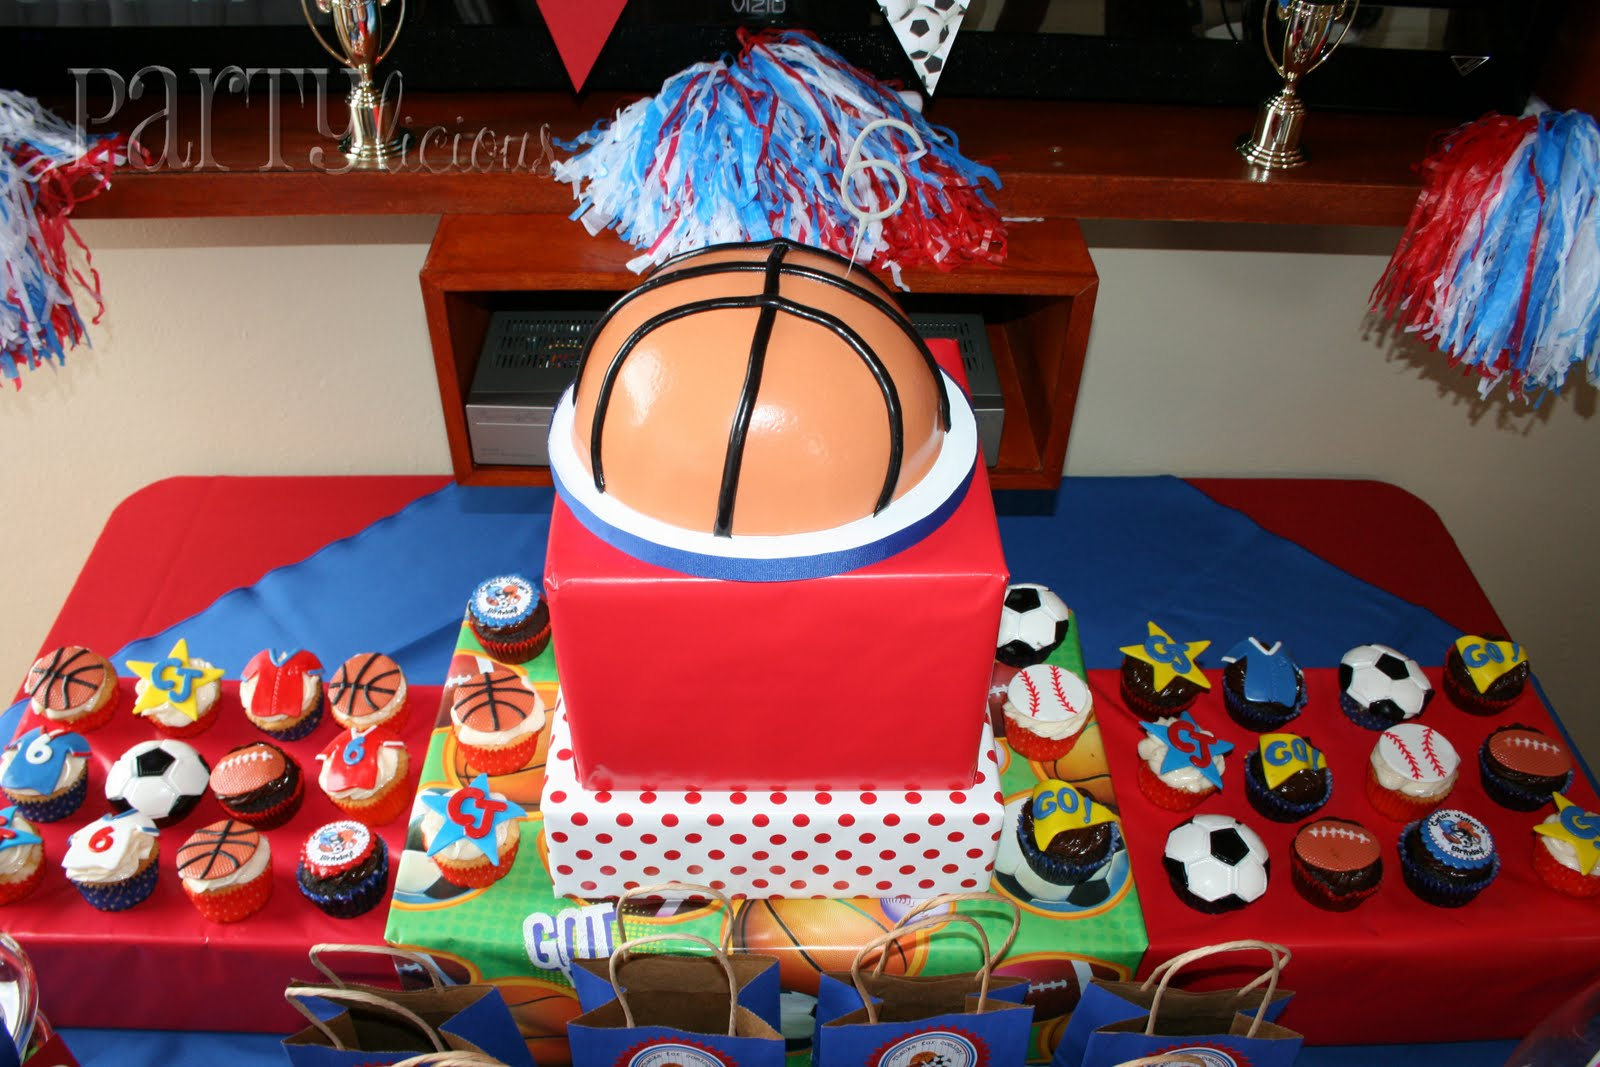 Partylicious All Star Birthday - All star birthday cake